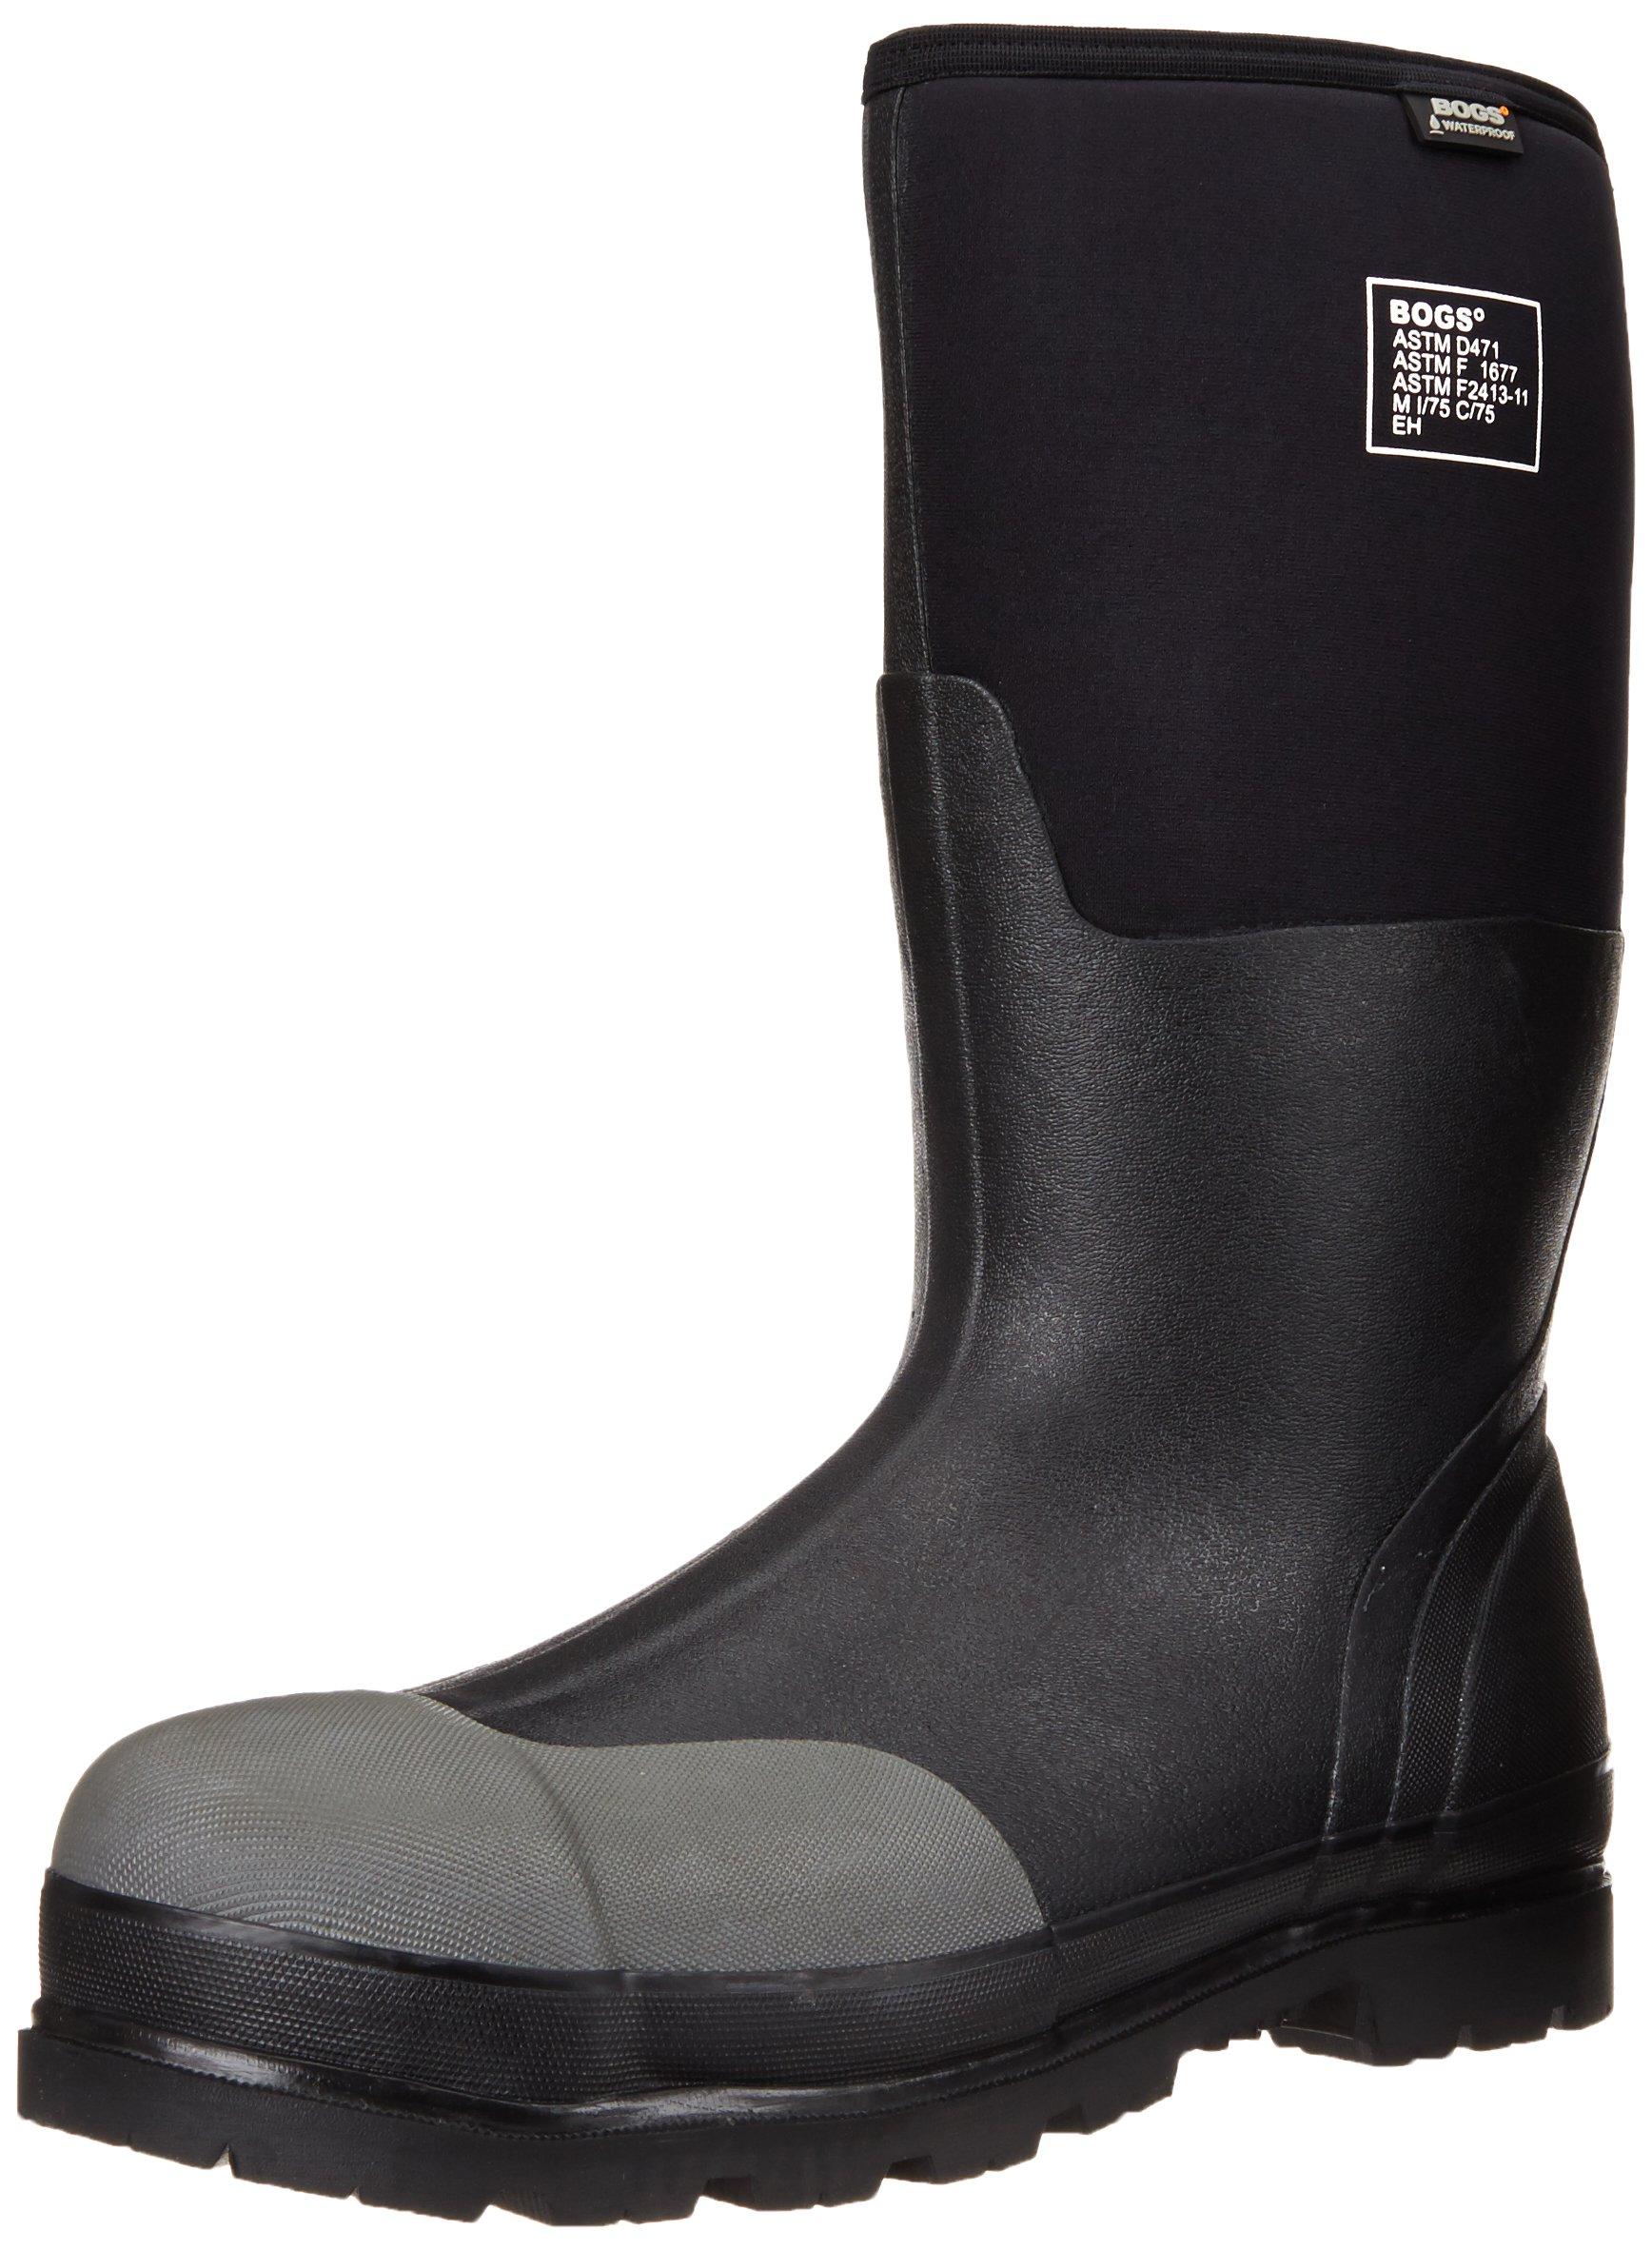 Bogs Men's Forge Tall Industrial Steel Toe Work Rain Boot, Black, 13 D(M) US by Bogs